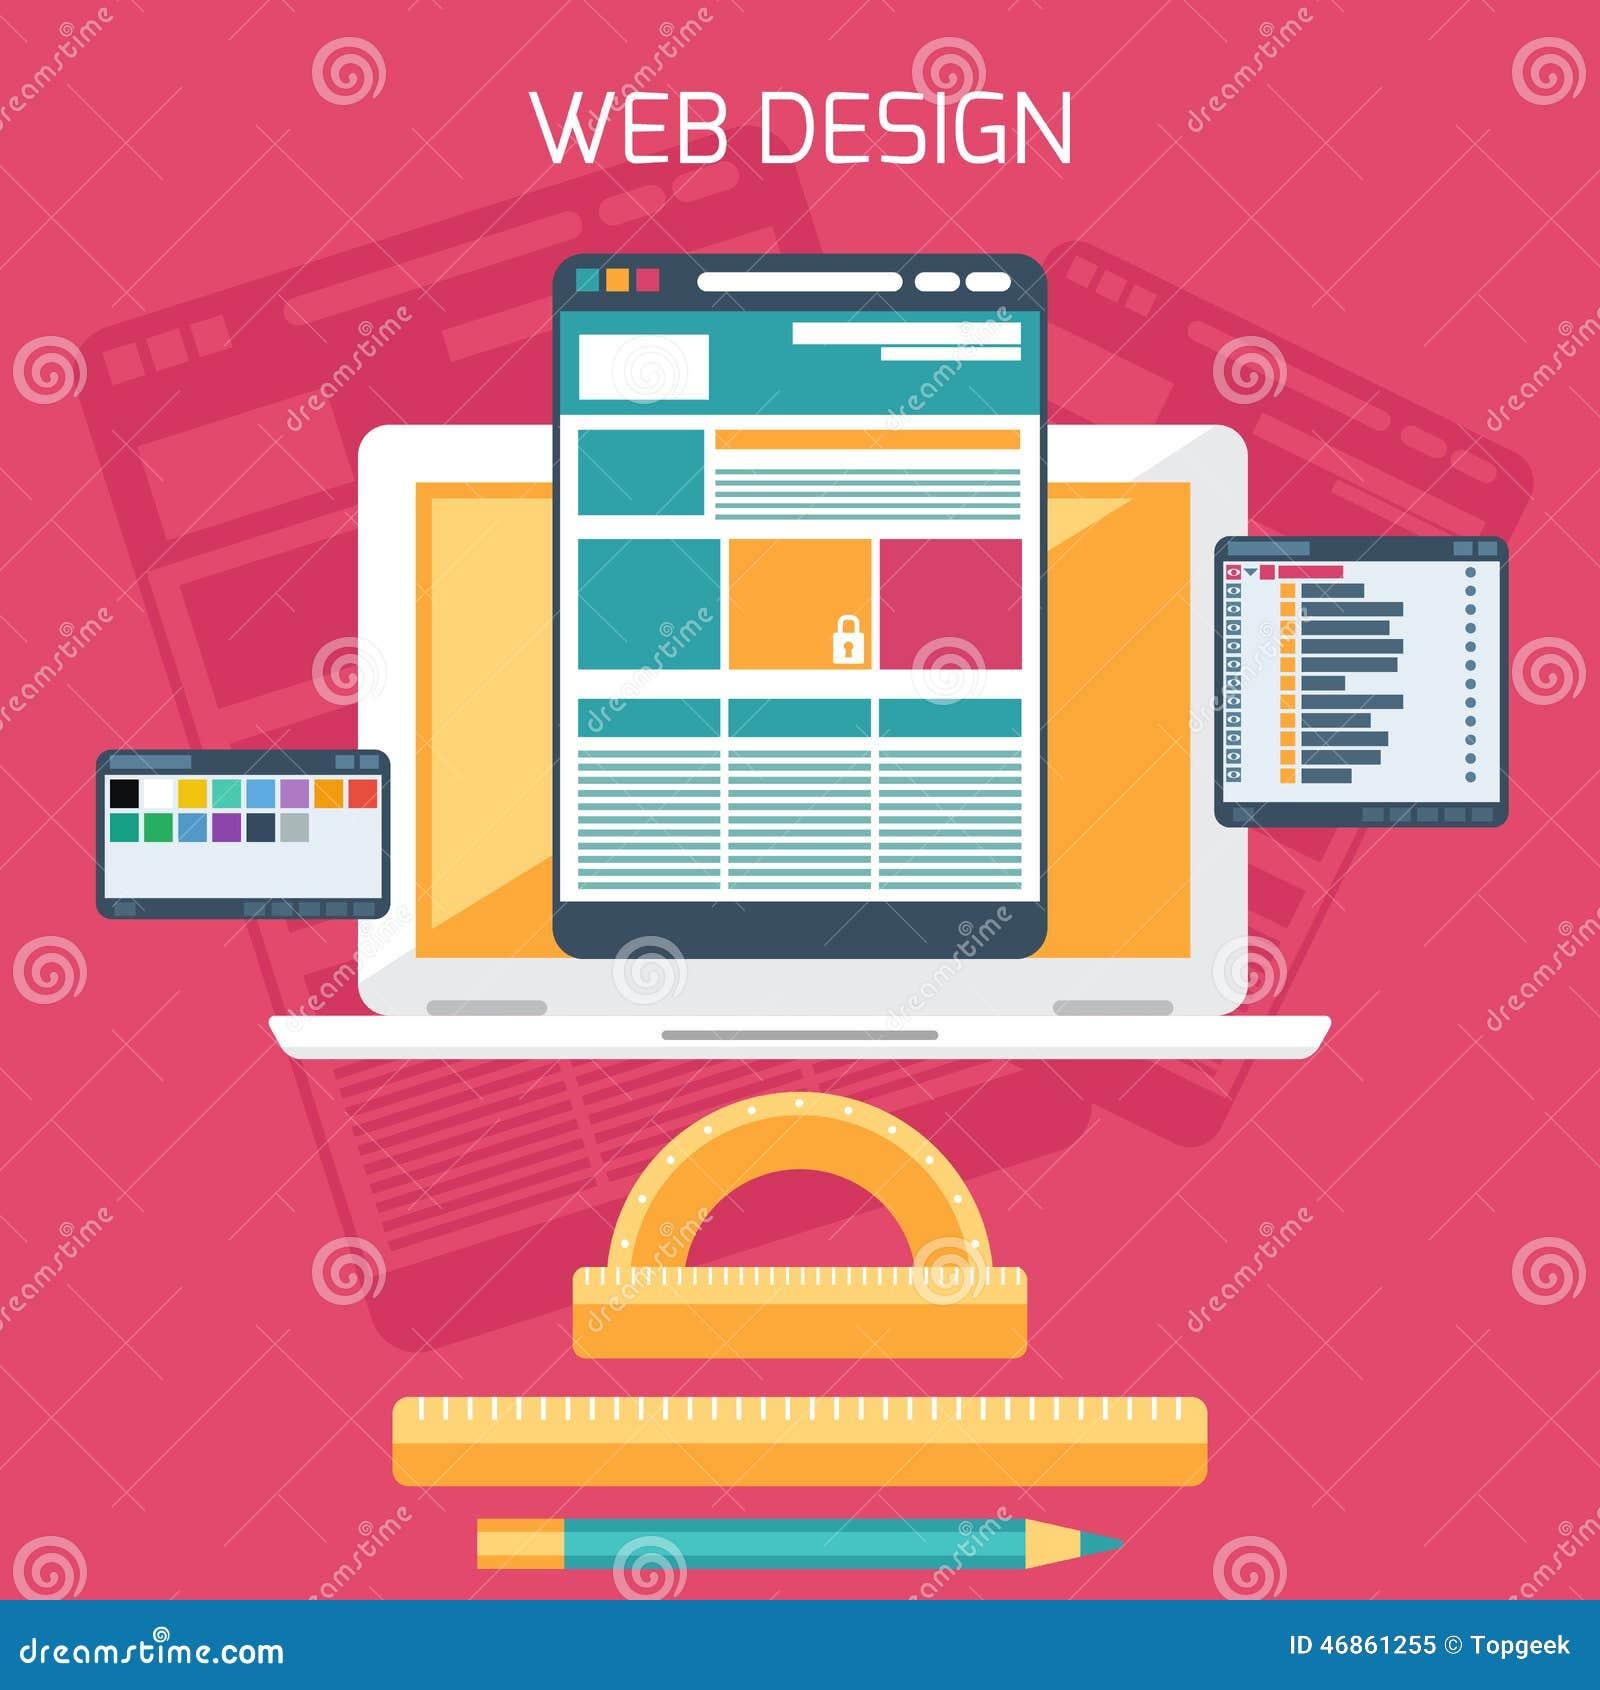 Web Design Program For Design And Architecture Stock